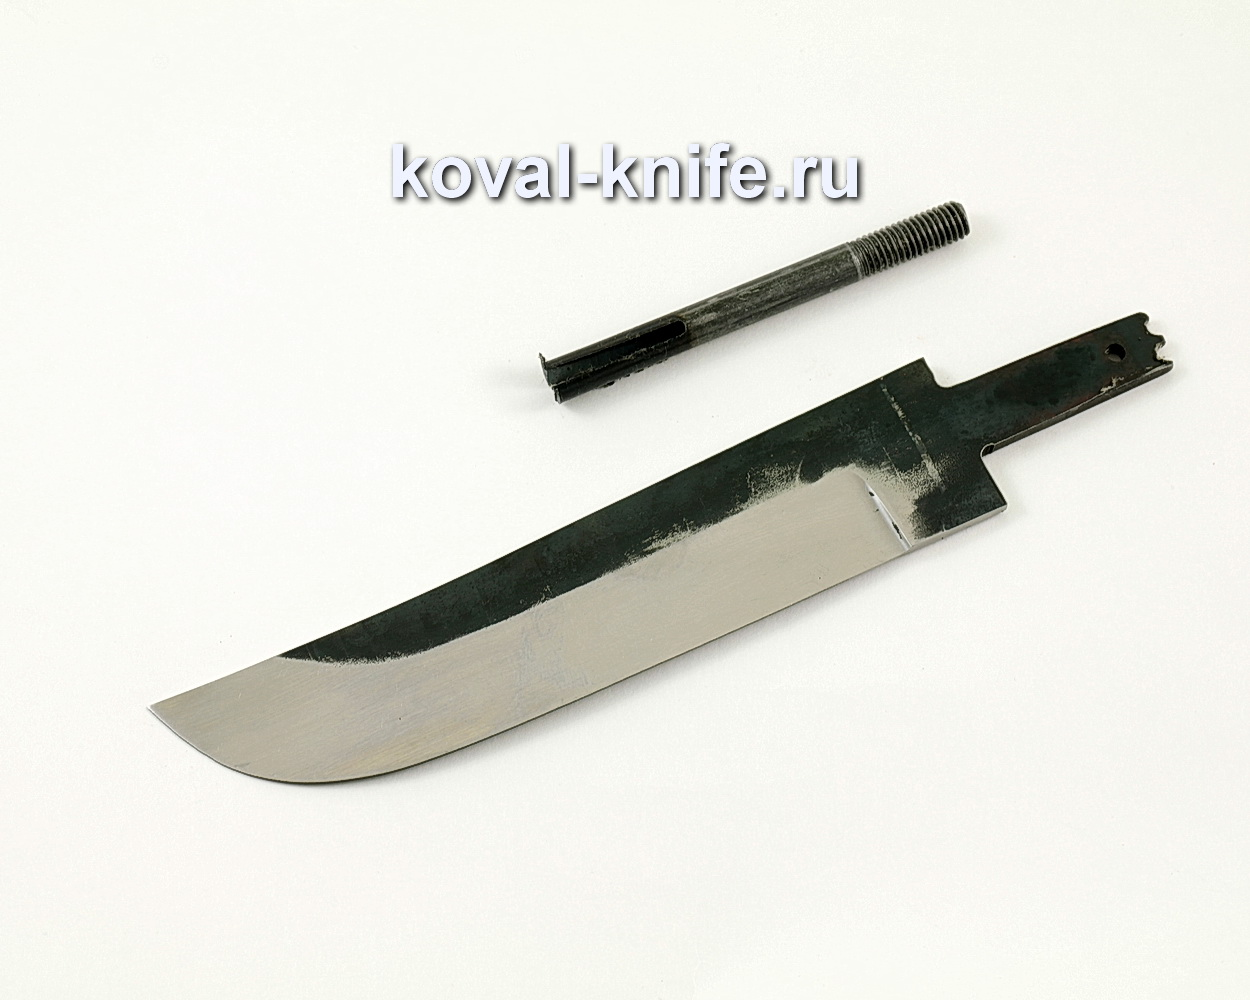 Клинок для ножа Узбек (кованая сталь 110Х18 МШД)